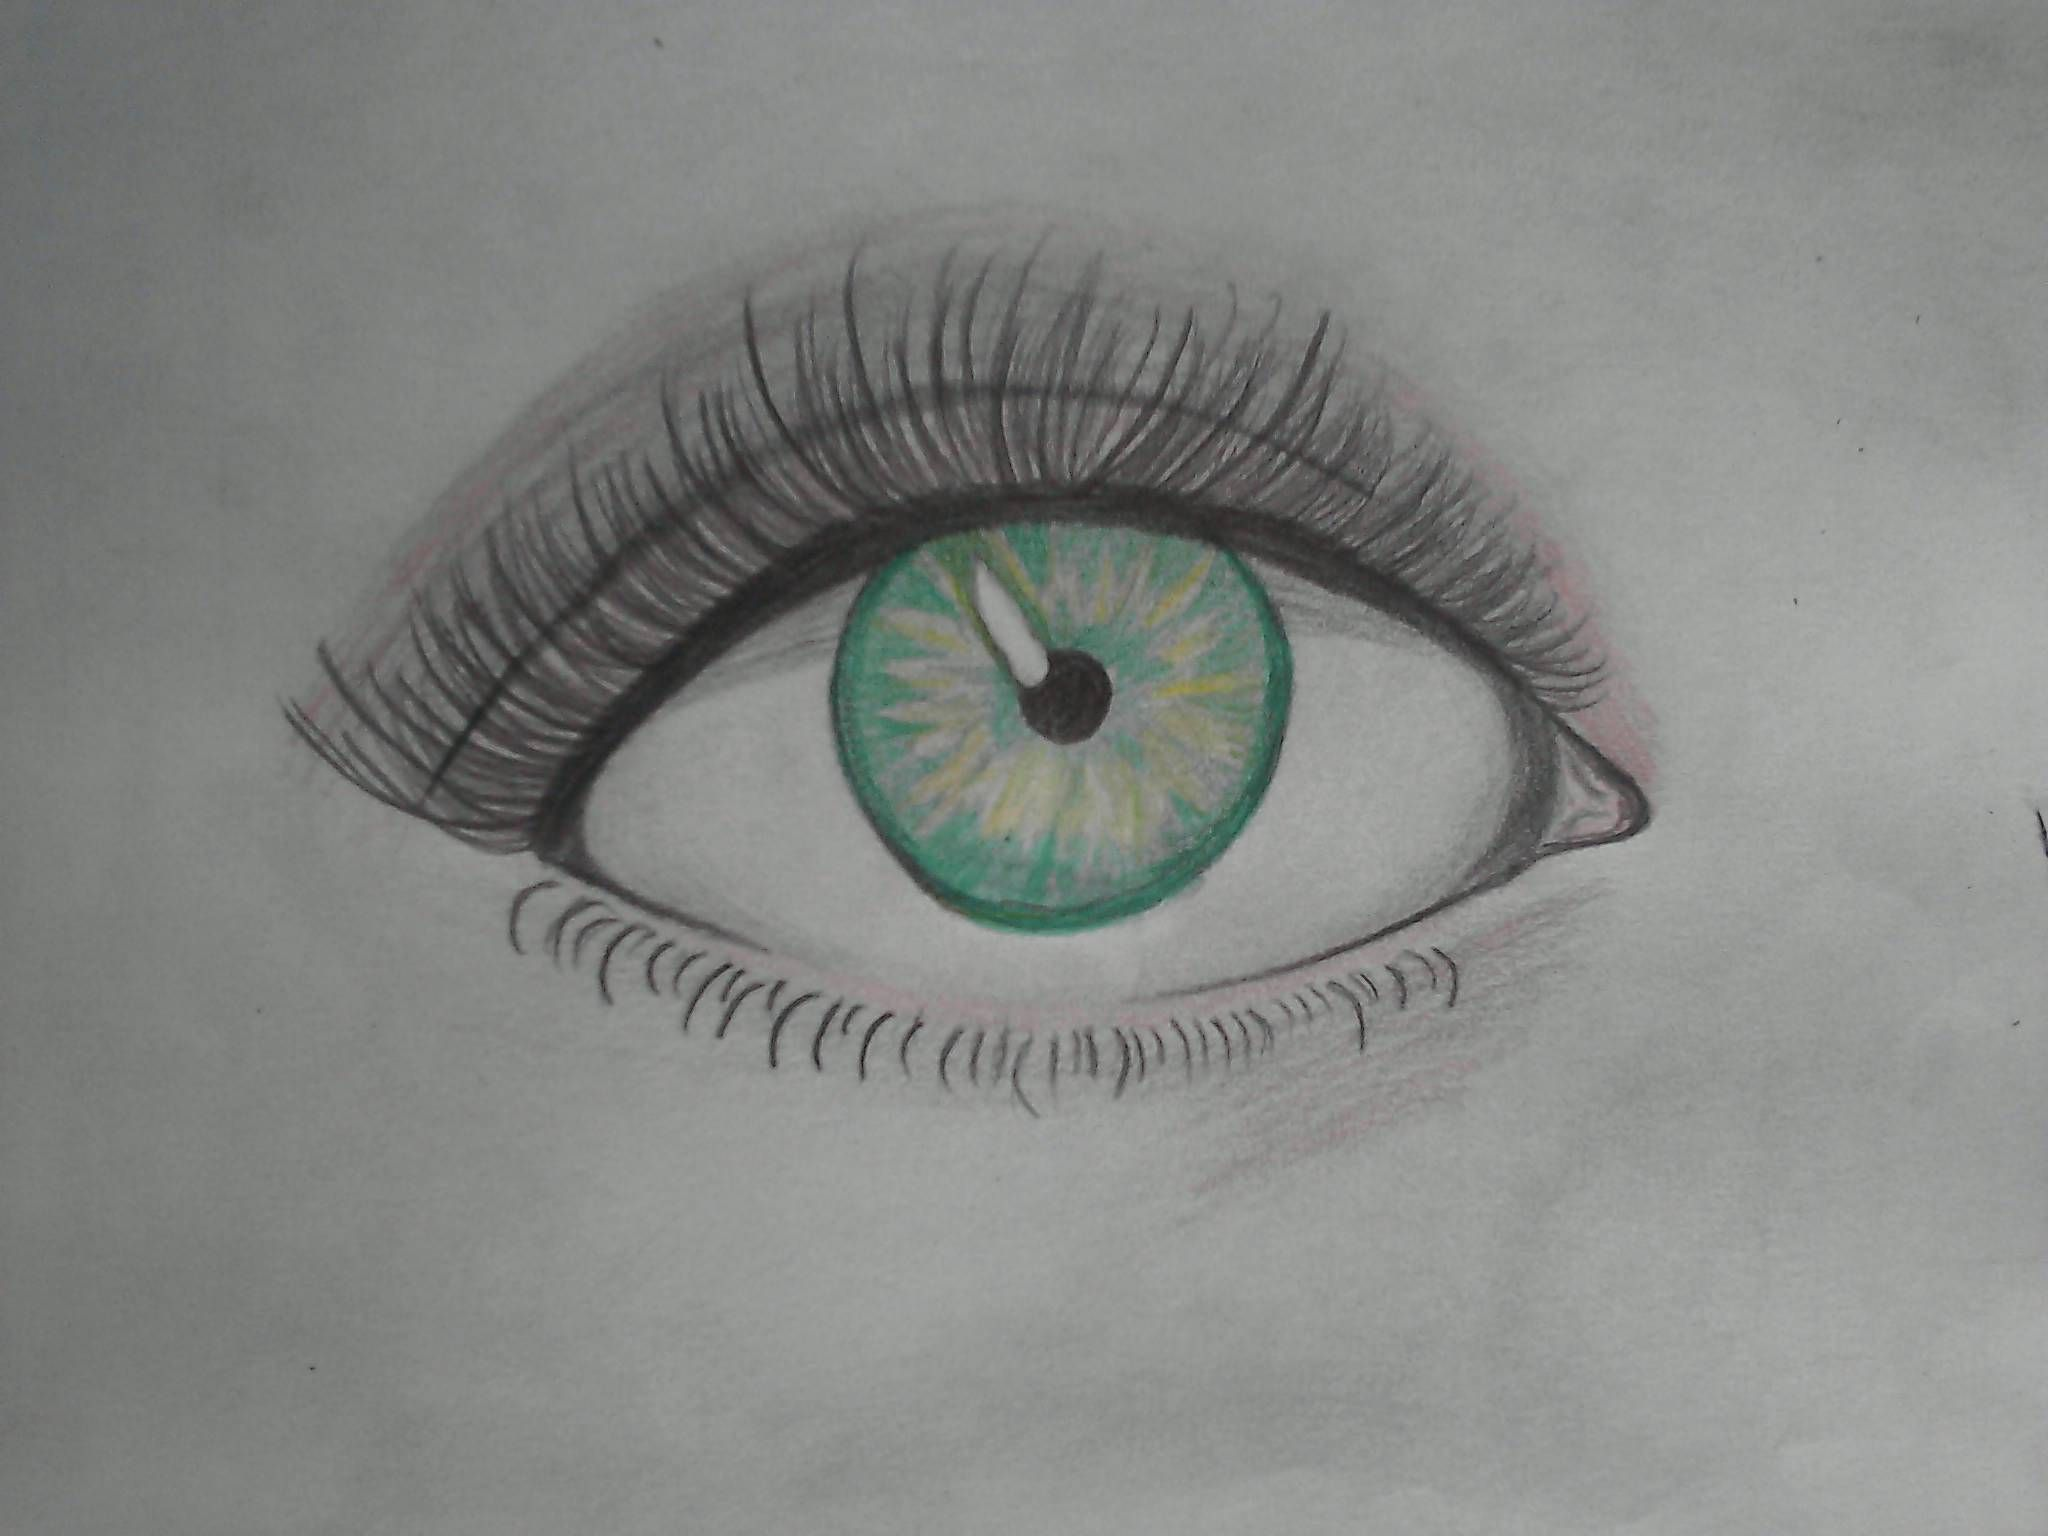 #eye #verde #ojo